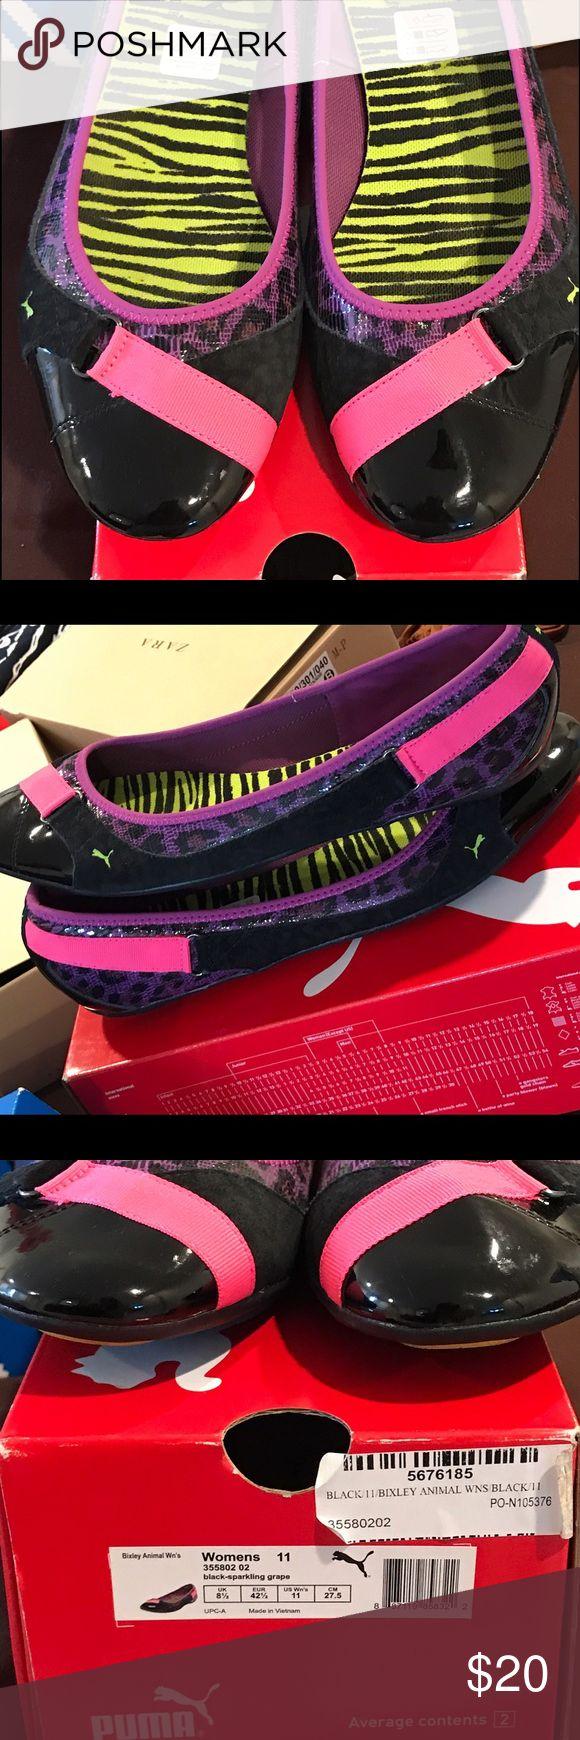 Puma ballerina flats Cute and comfy puma ballerina flats gently used. Puma Shoes Flats & Loafers